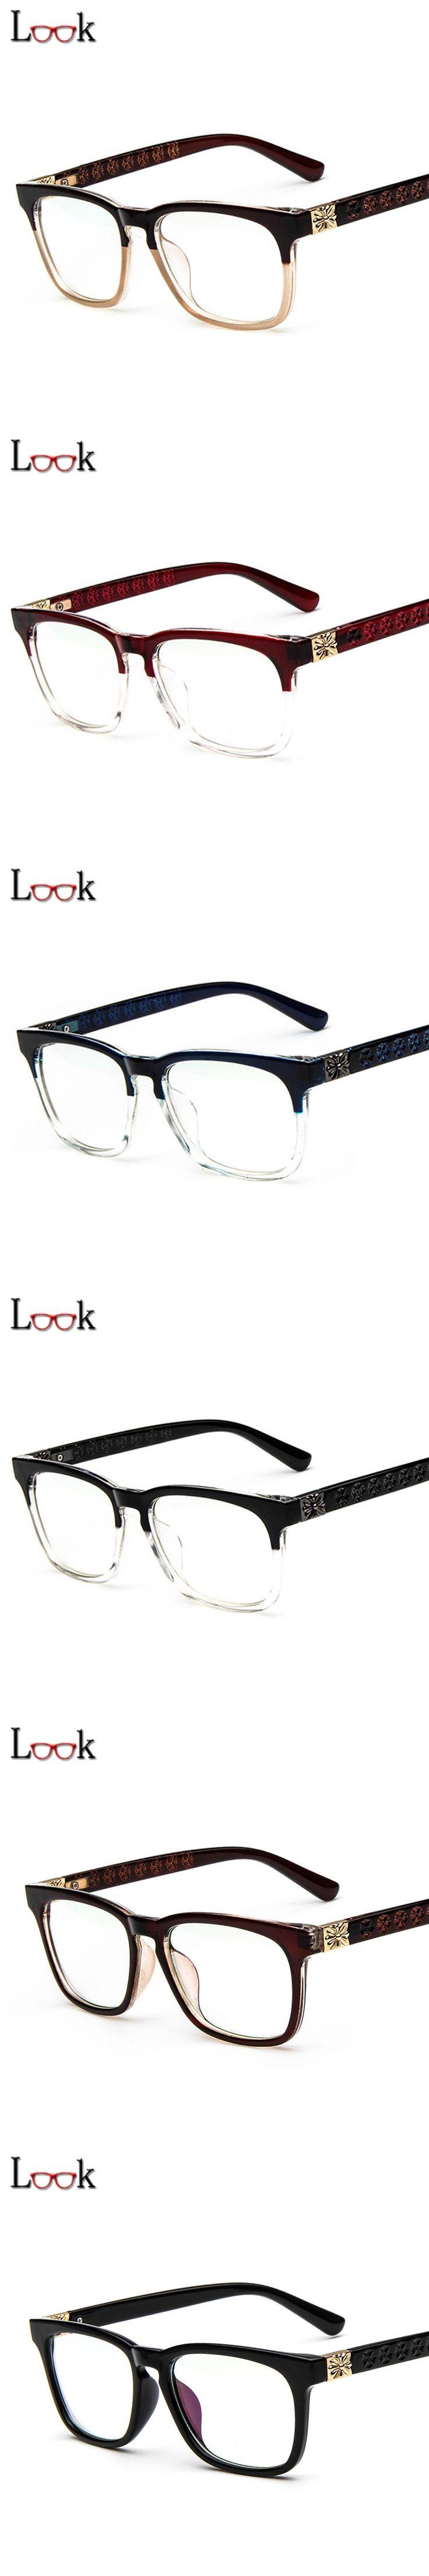 New 2017 Brand Optical Eyeglasses Frames For Women Men Lentes Opticos Prescription Glasses Frame Eyewear Oculos Lunette De Vue